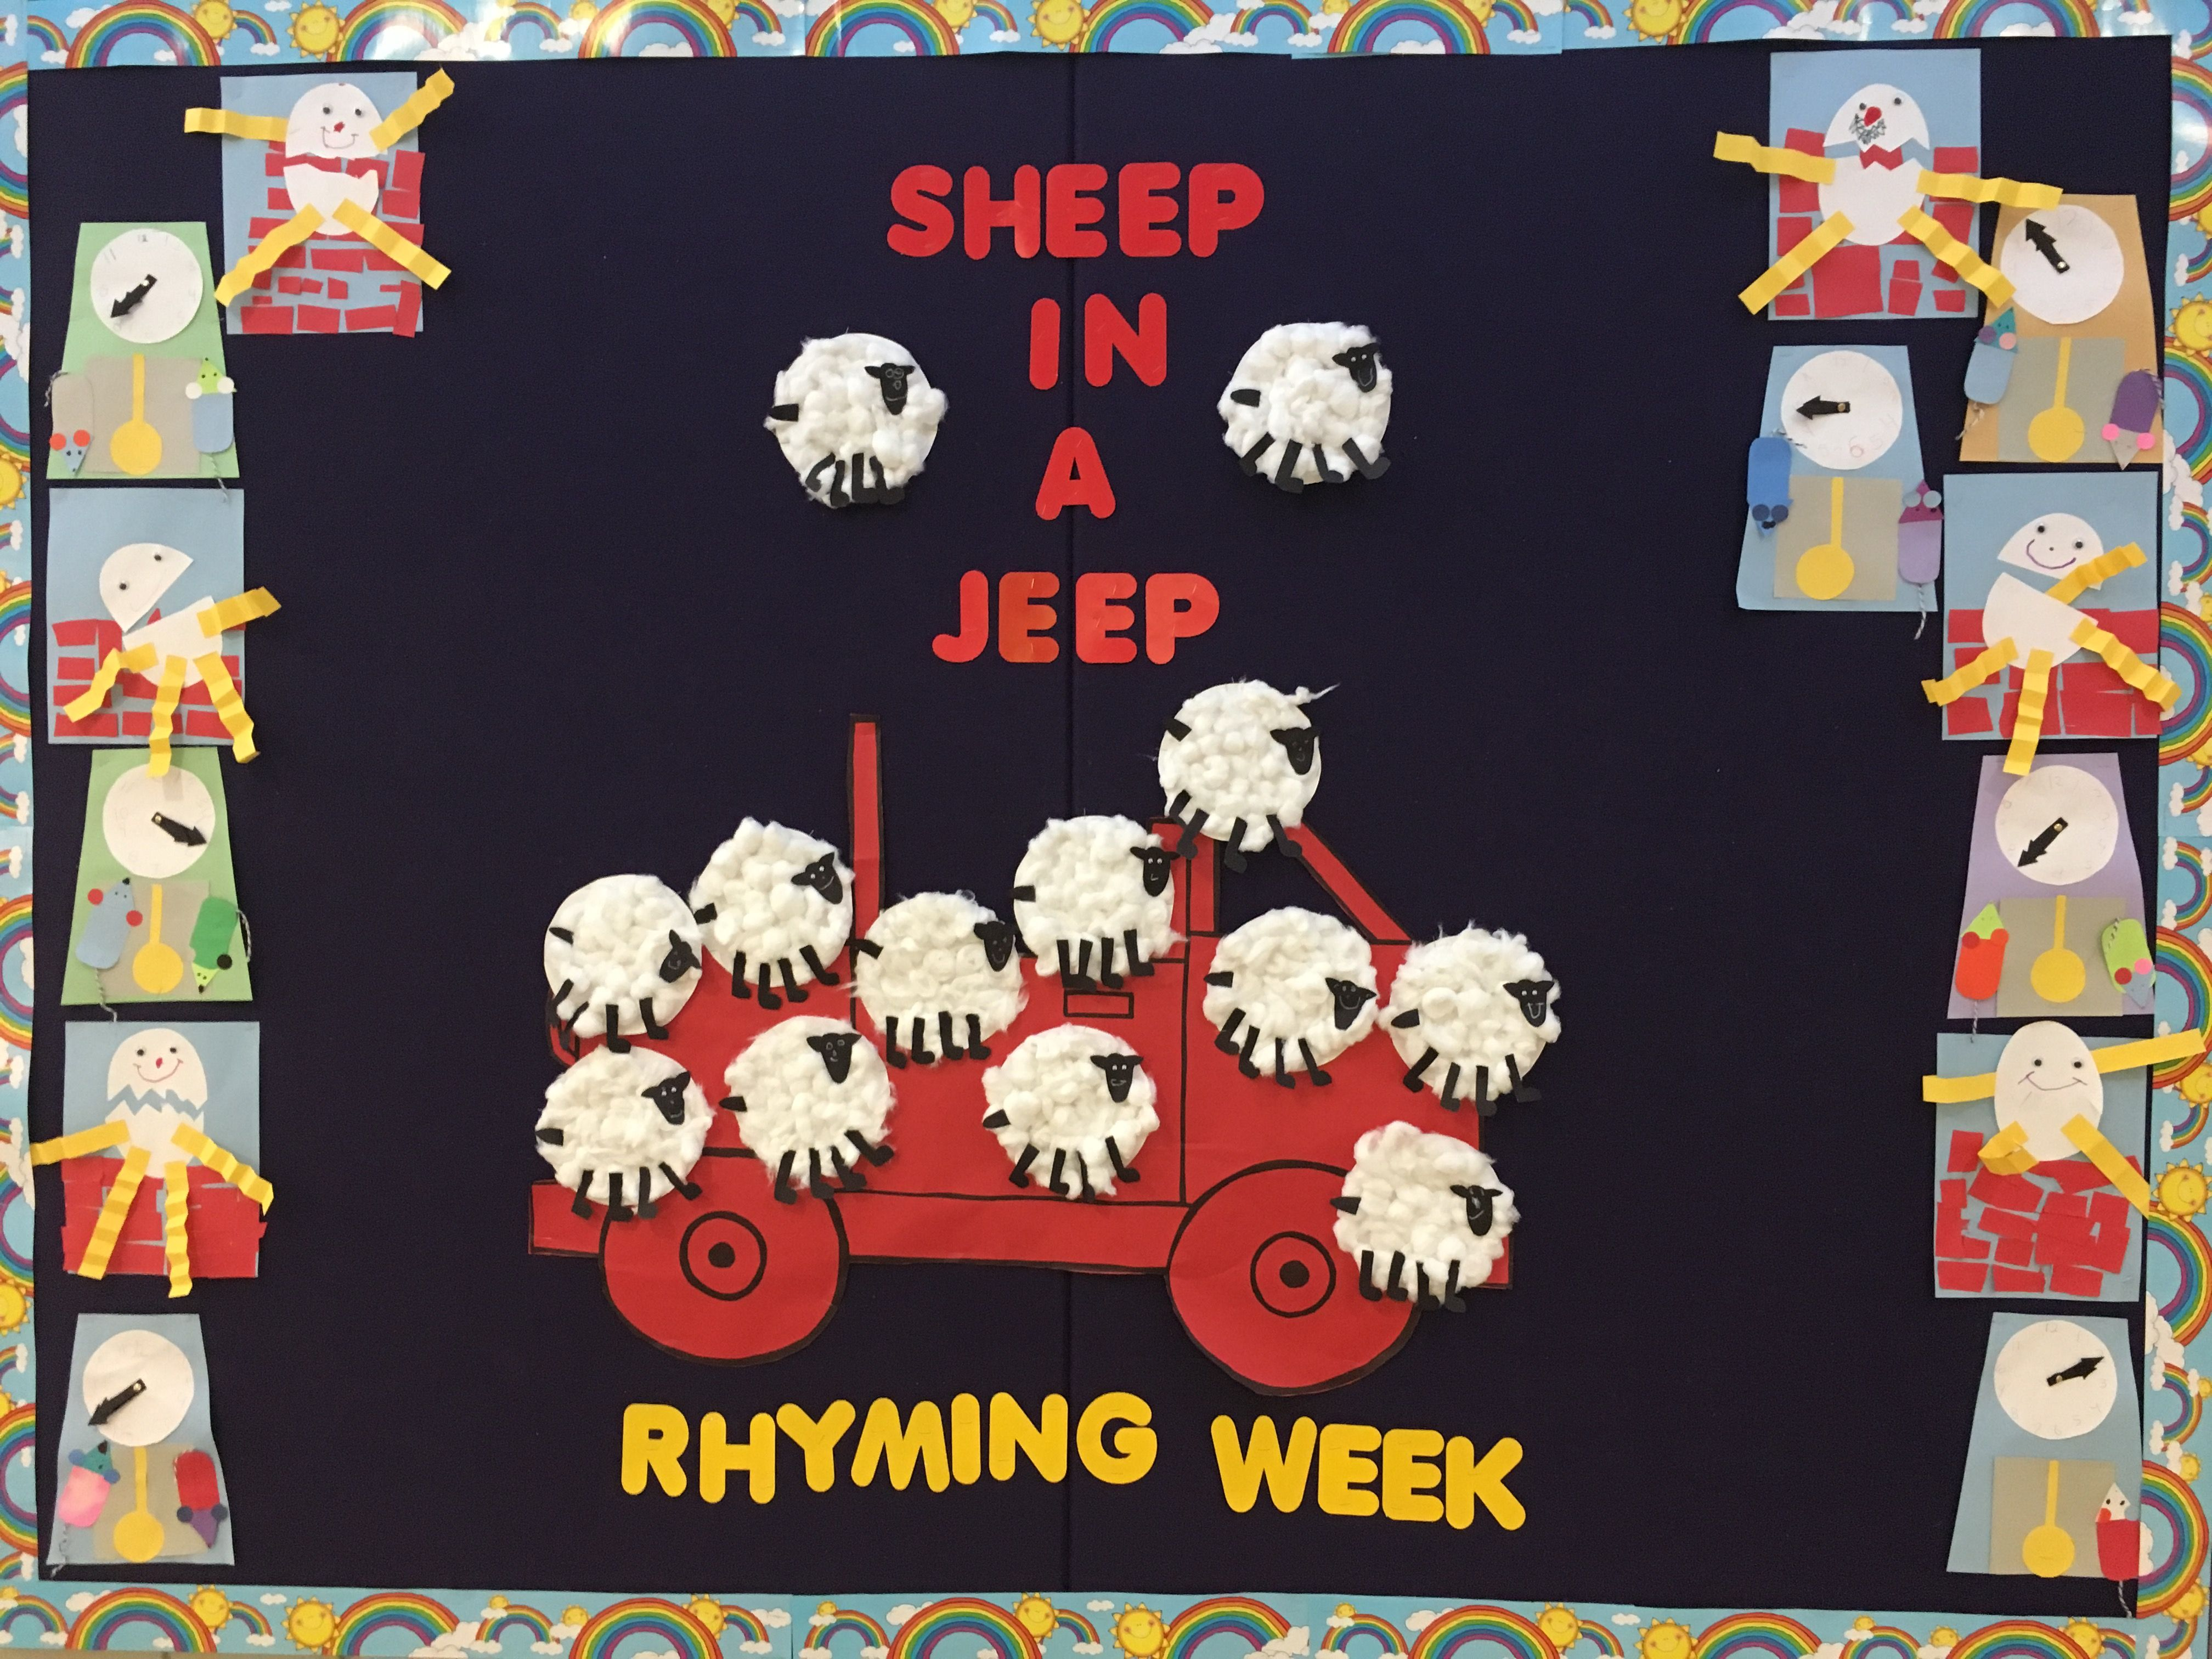 Preschool Bulletin Boards Image By Jeanette Spring On